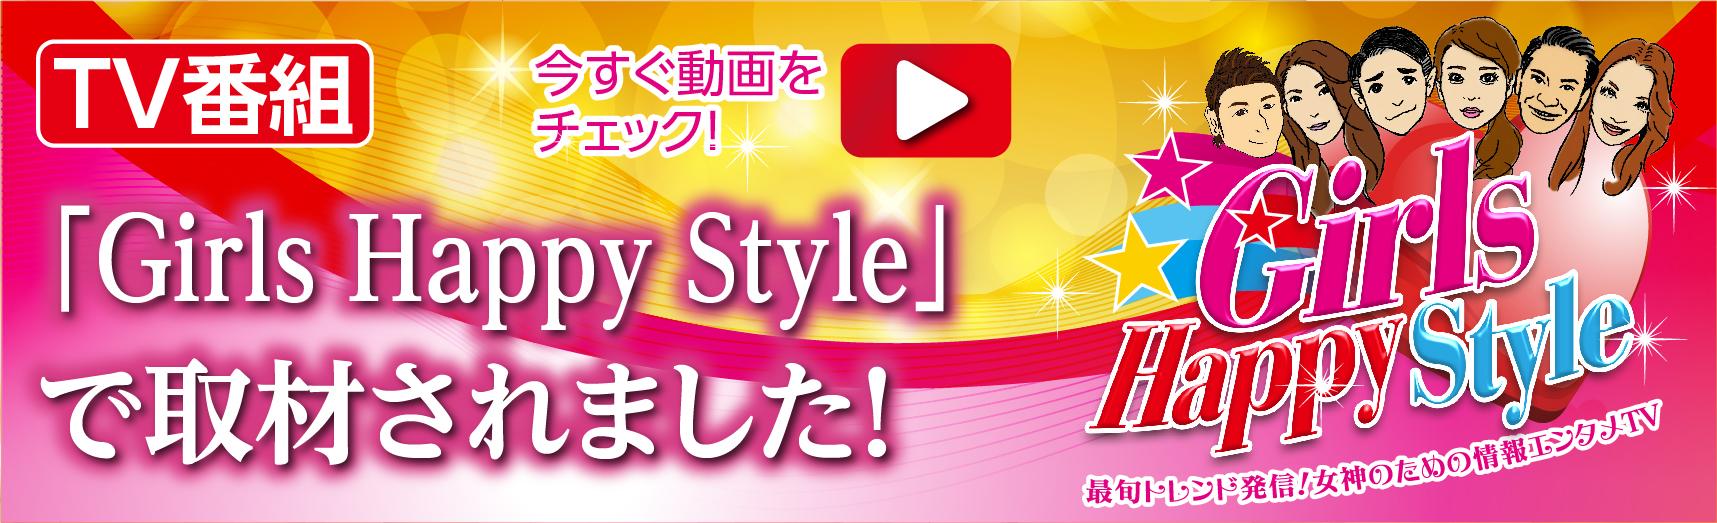 RIKKAが東京女神コレクション【ガールズハッピースタイル】で紹介されました。